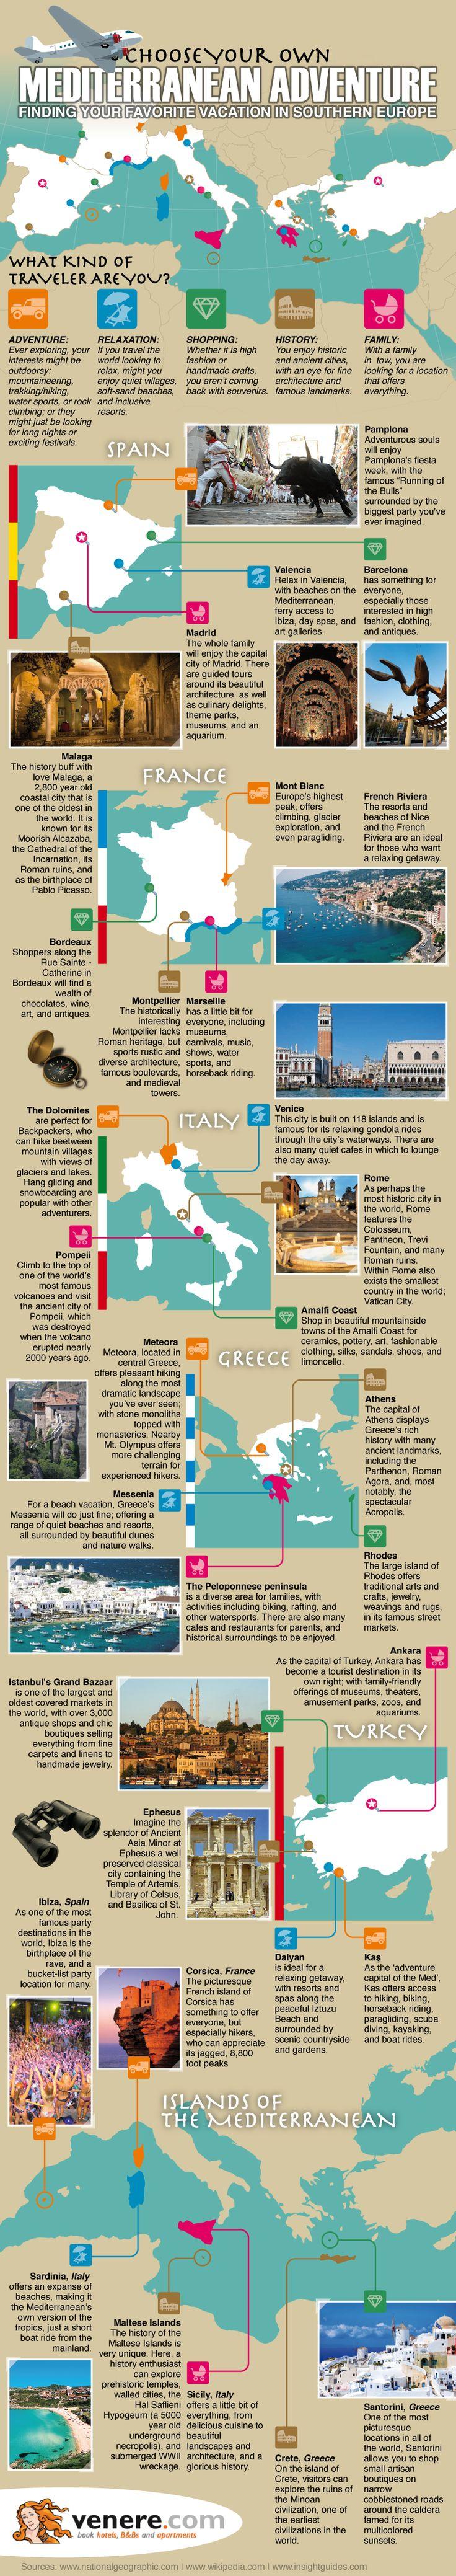 Choose Your Own Mediterranean Adventure   #Adventure #Travel #infographic